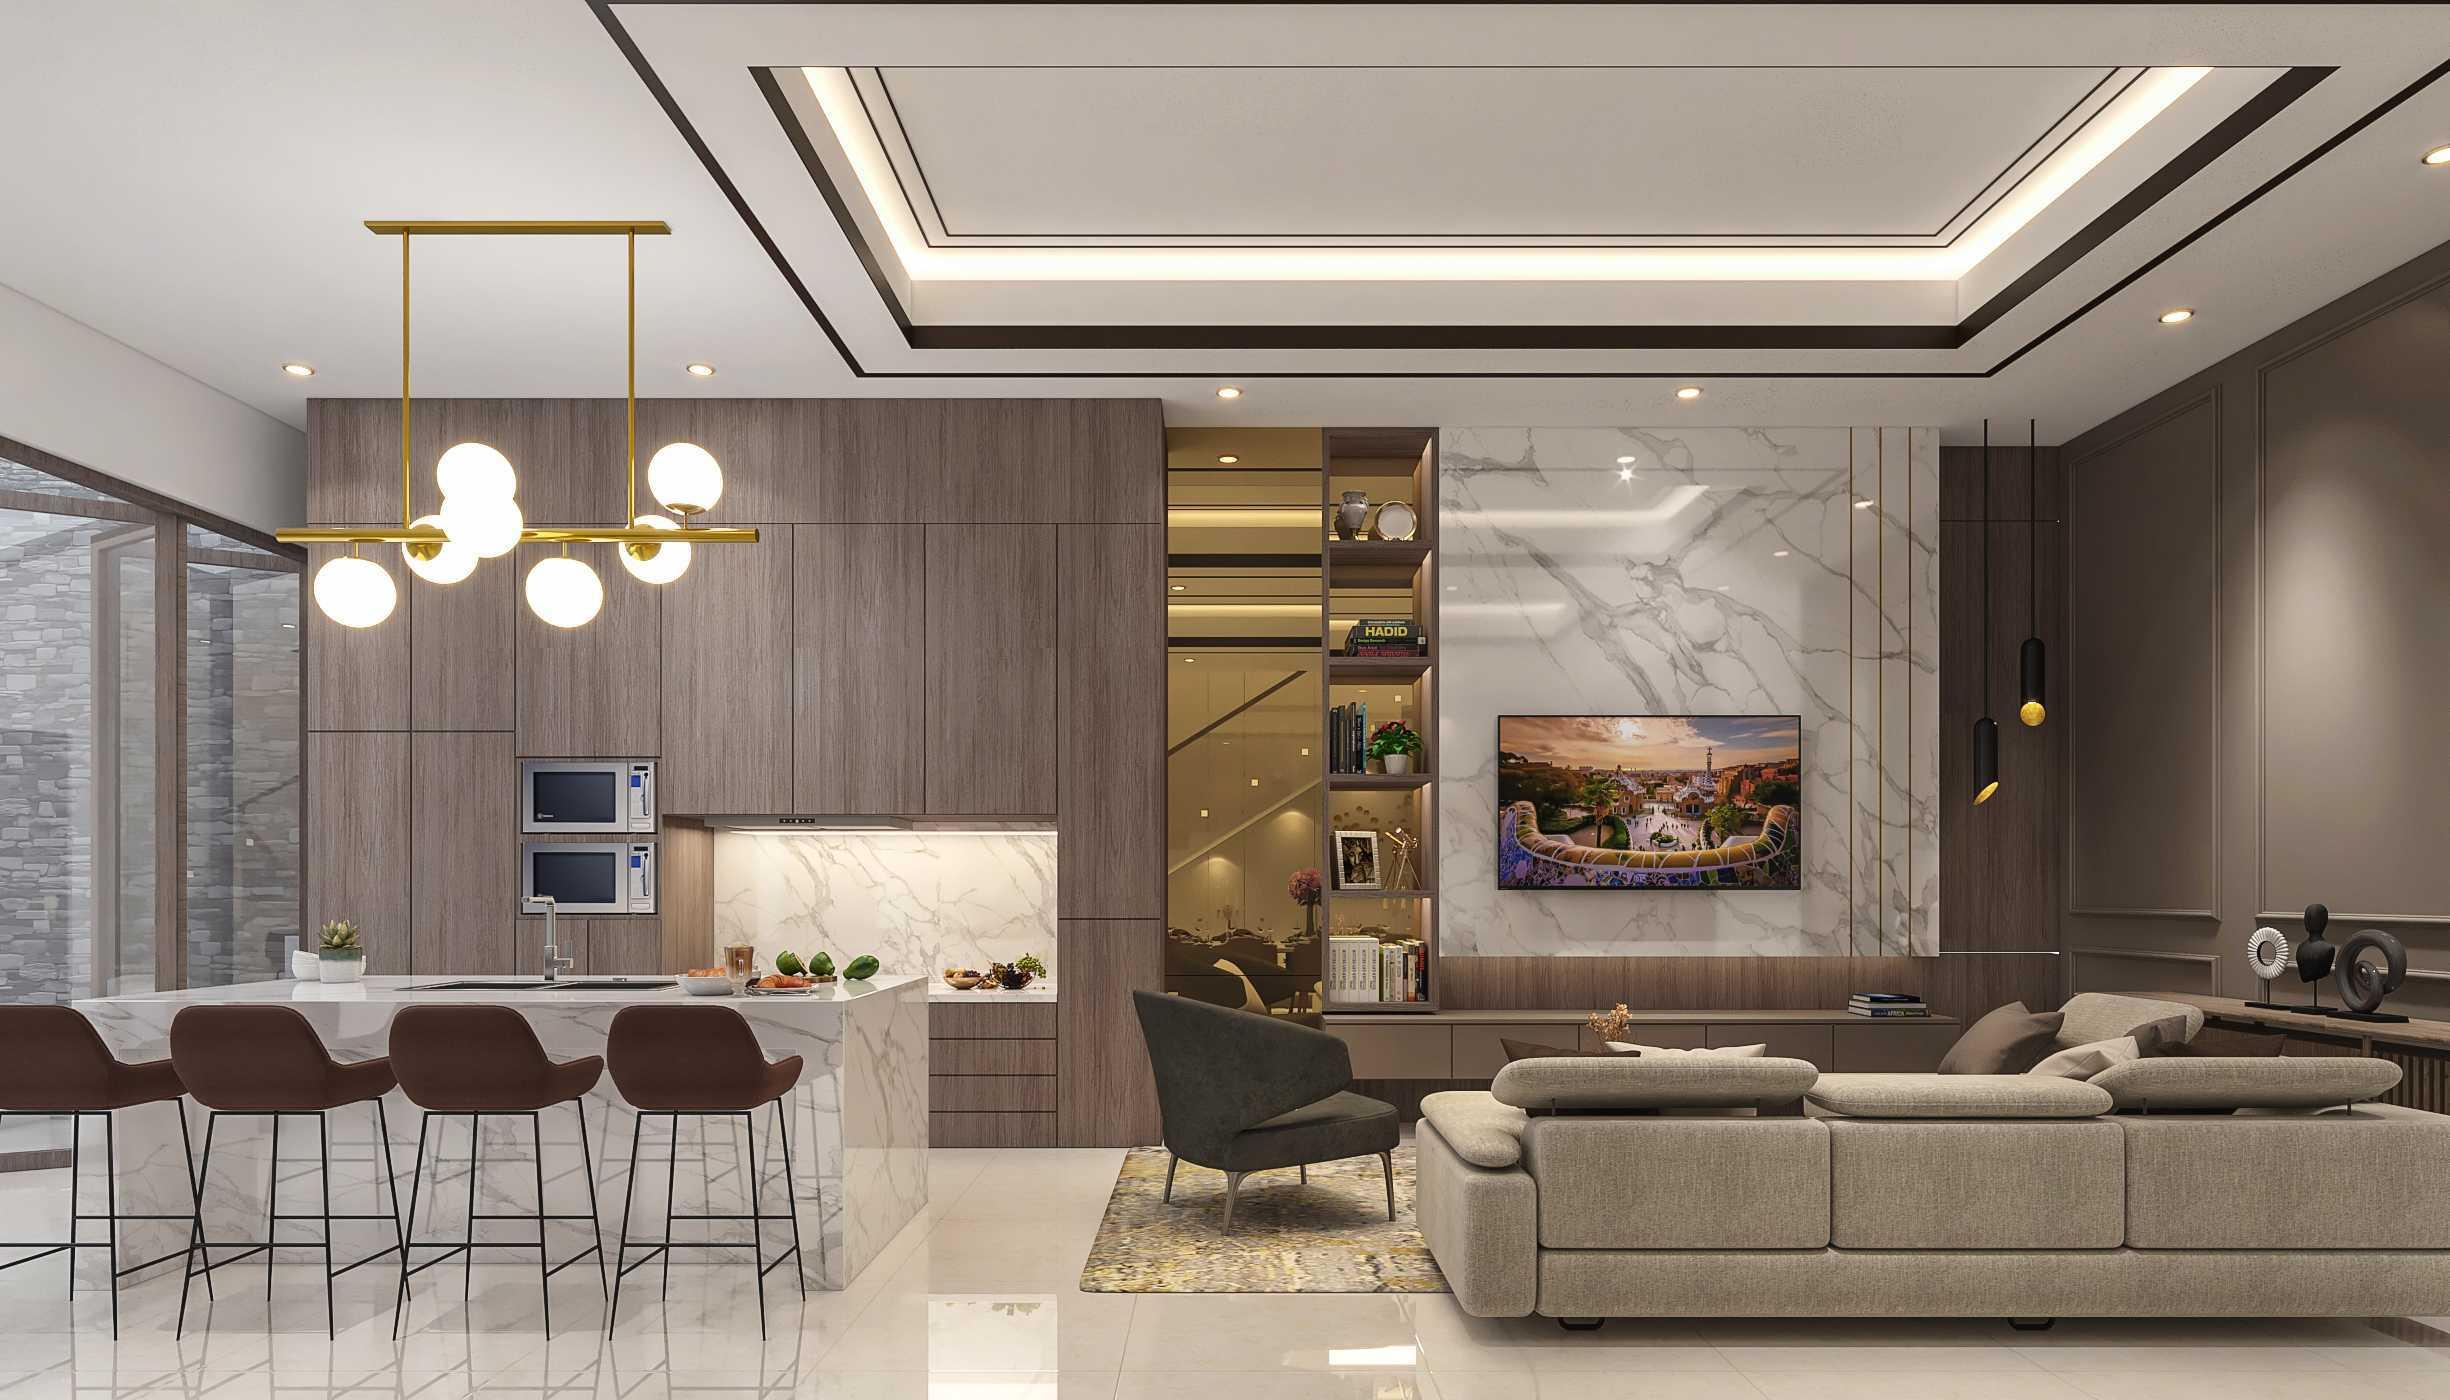 Mula Design Studio S House Jakarta Utara, Kota Jkt Utara, Daerah Khusus Ibukota Jakarta, Indonesia Jakarta Utara, Kota Jkt Utara, Daerah Khusus Ibukota Jakarta, Indonesia Mula-Design-Studio-S-House   104807